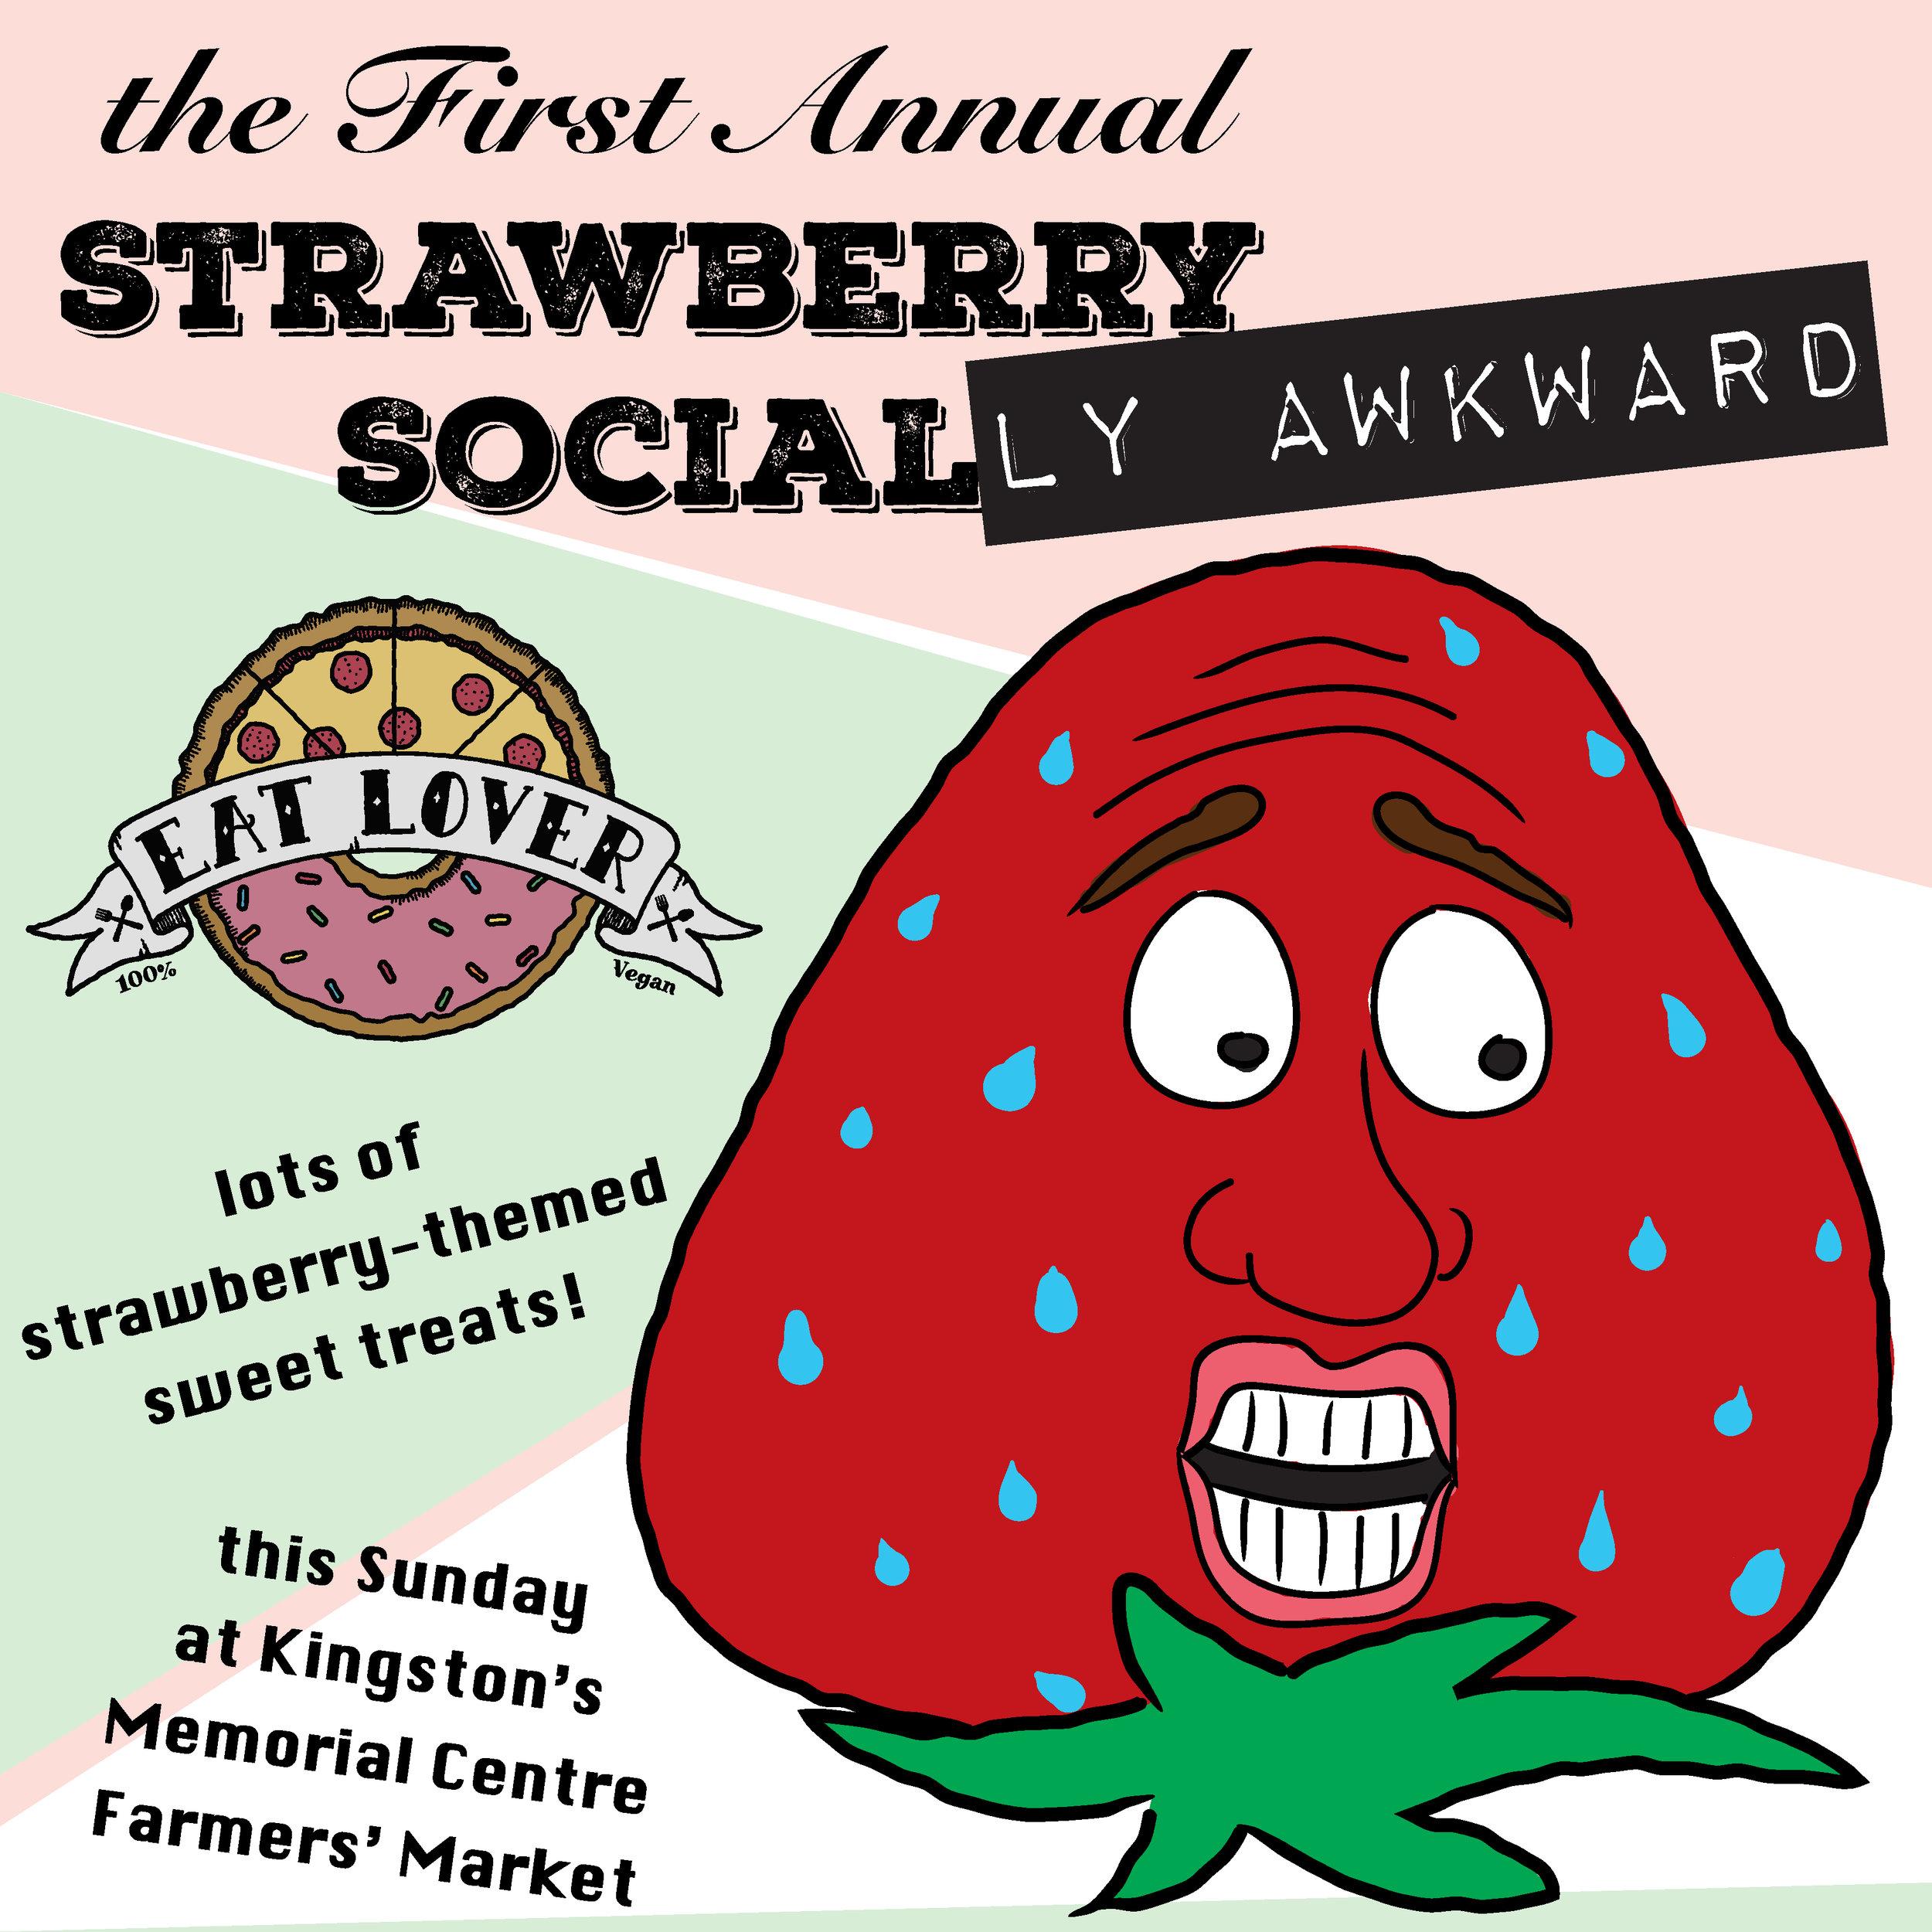 eat lover -  strawberry socially awkward - ad.jpg